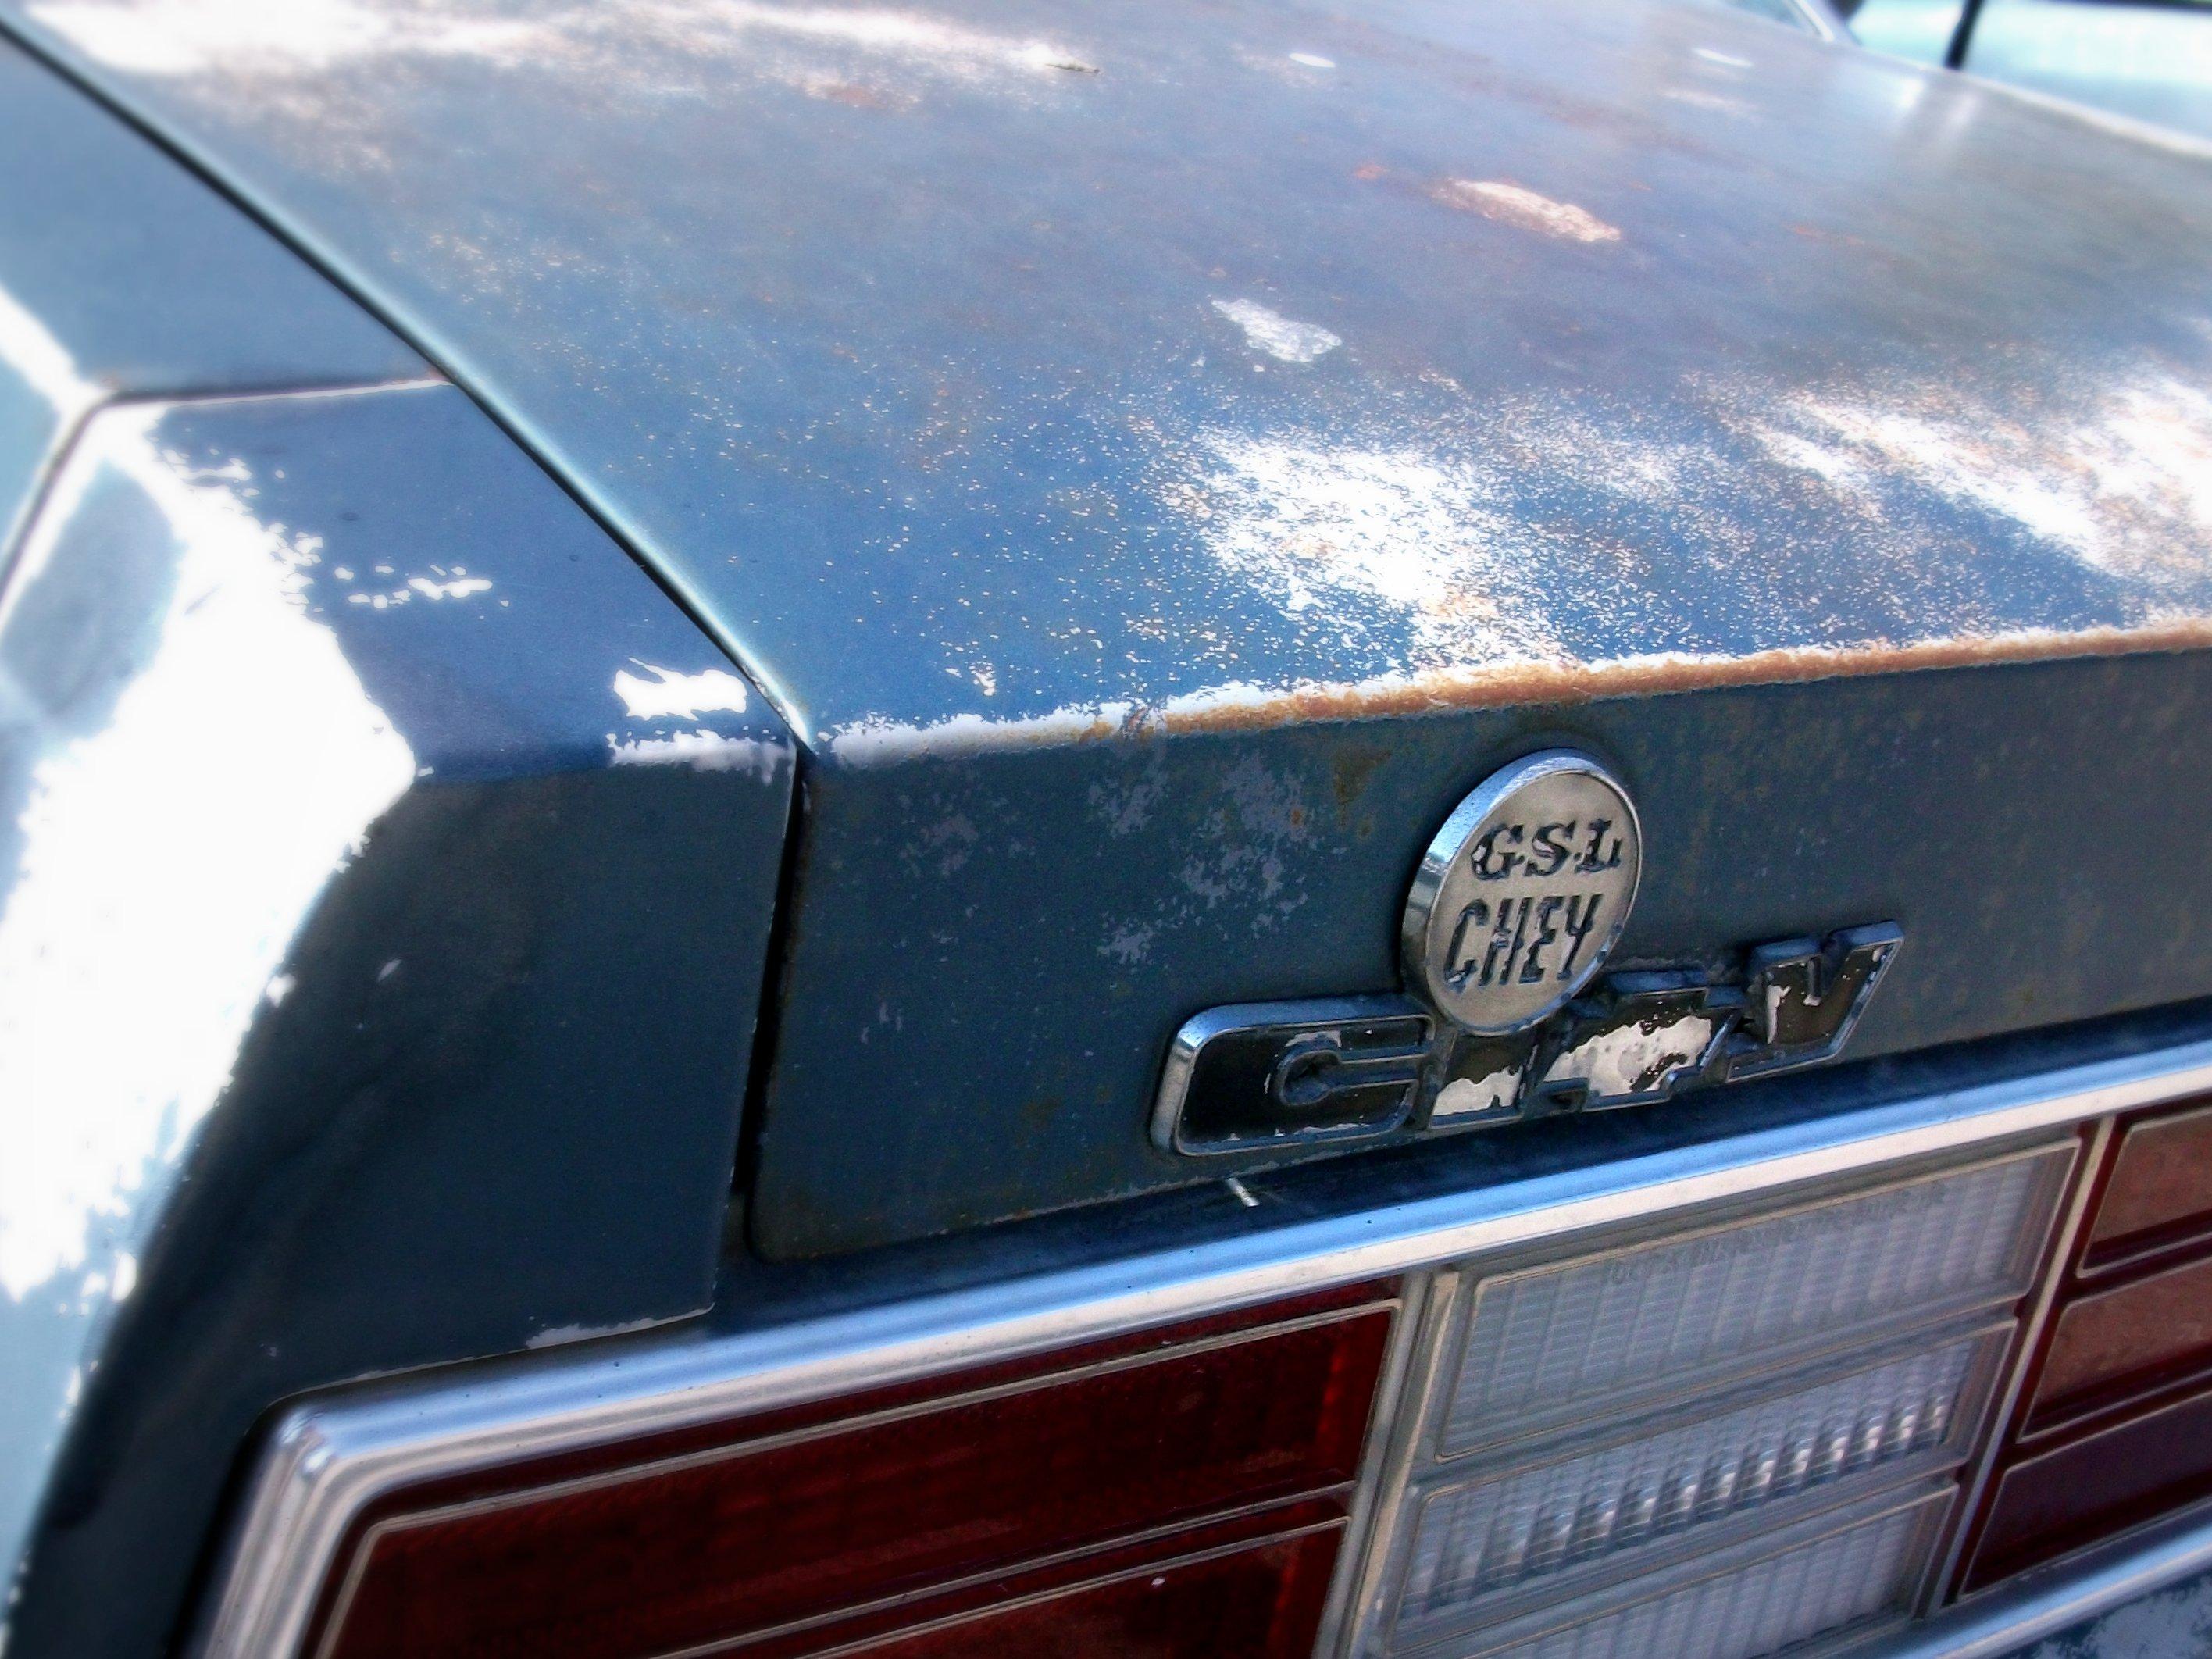 Gsl Chev City Calgary Used Cars